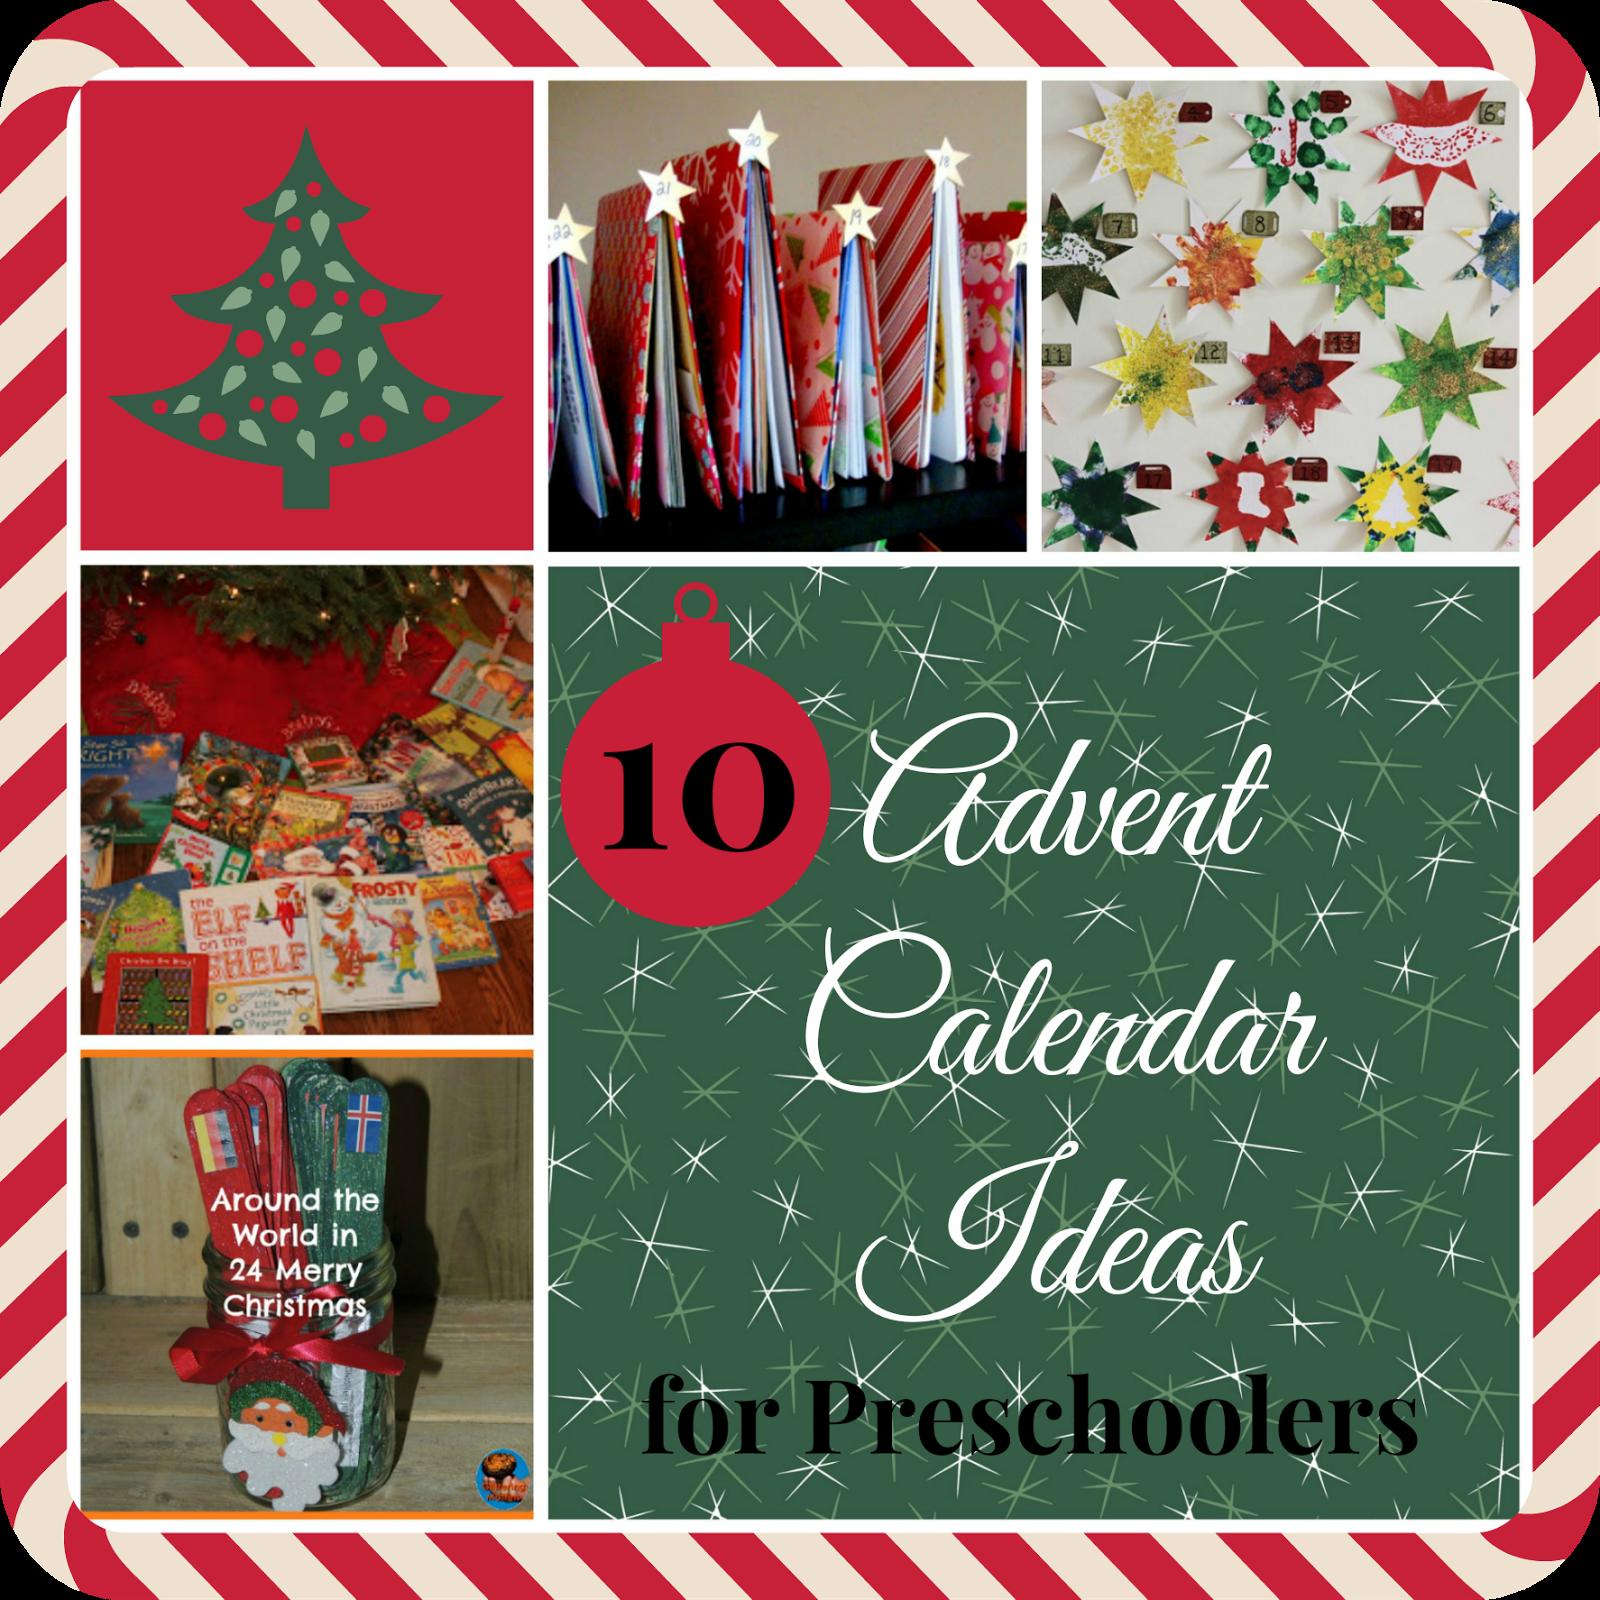 mama pea pod 10 christmas advent calendar ideas for preschoolers. Black Bedroom Furniture Sets. Home Design Ideas